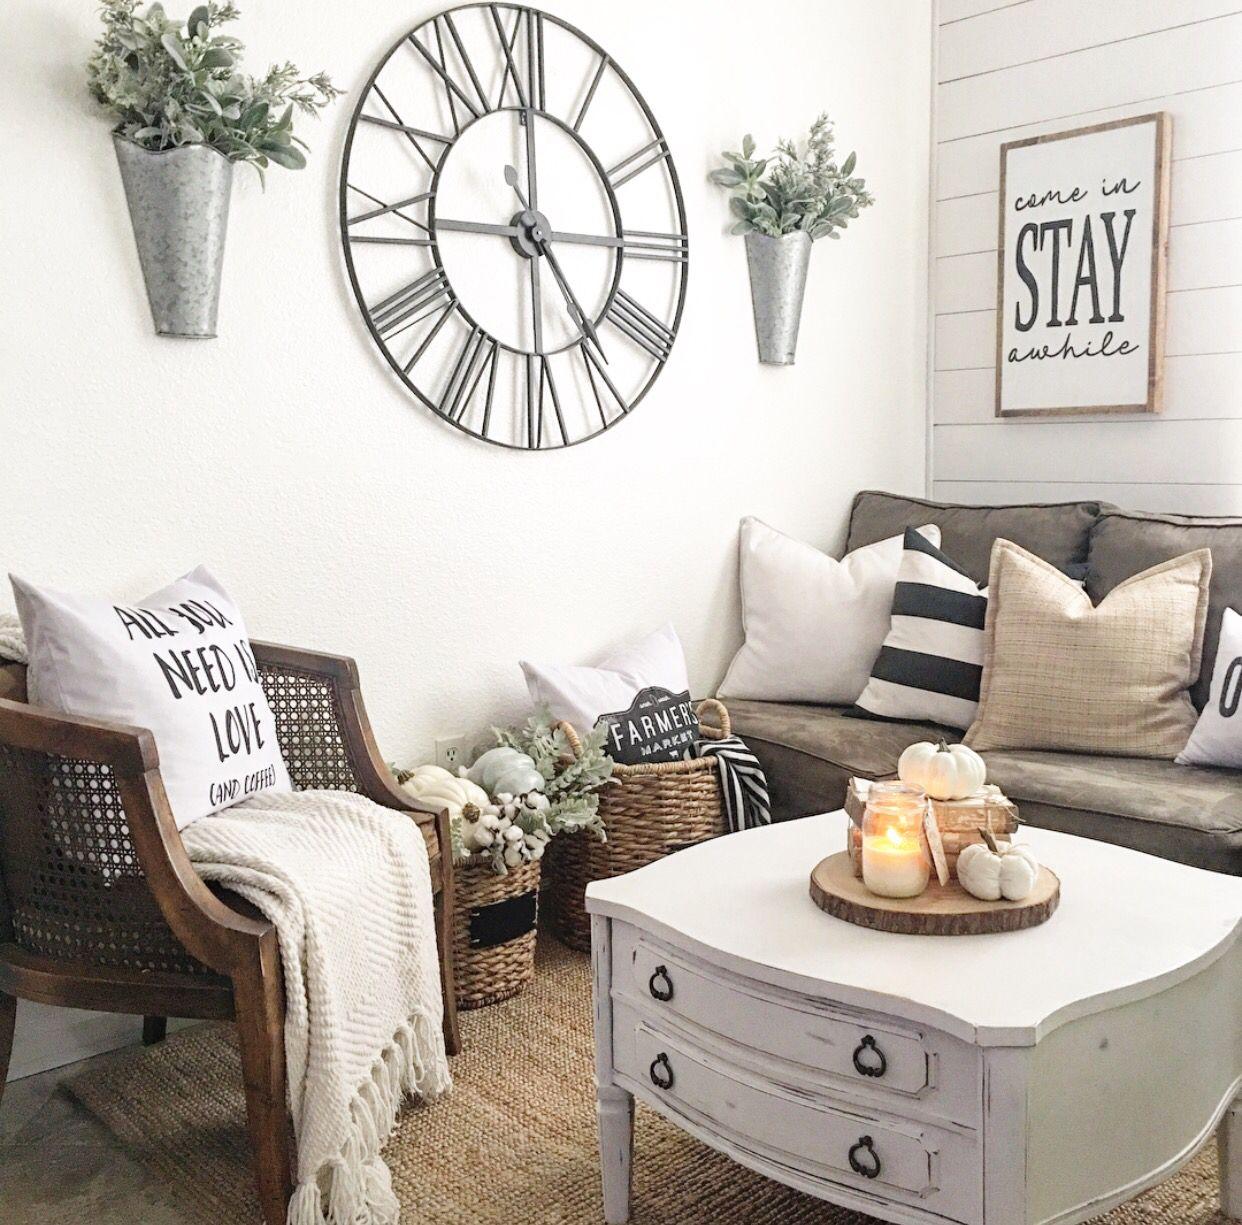 Room Decor: Neutral Farmhouse Style -IG @nellyfriedel